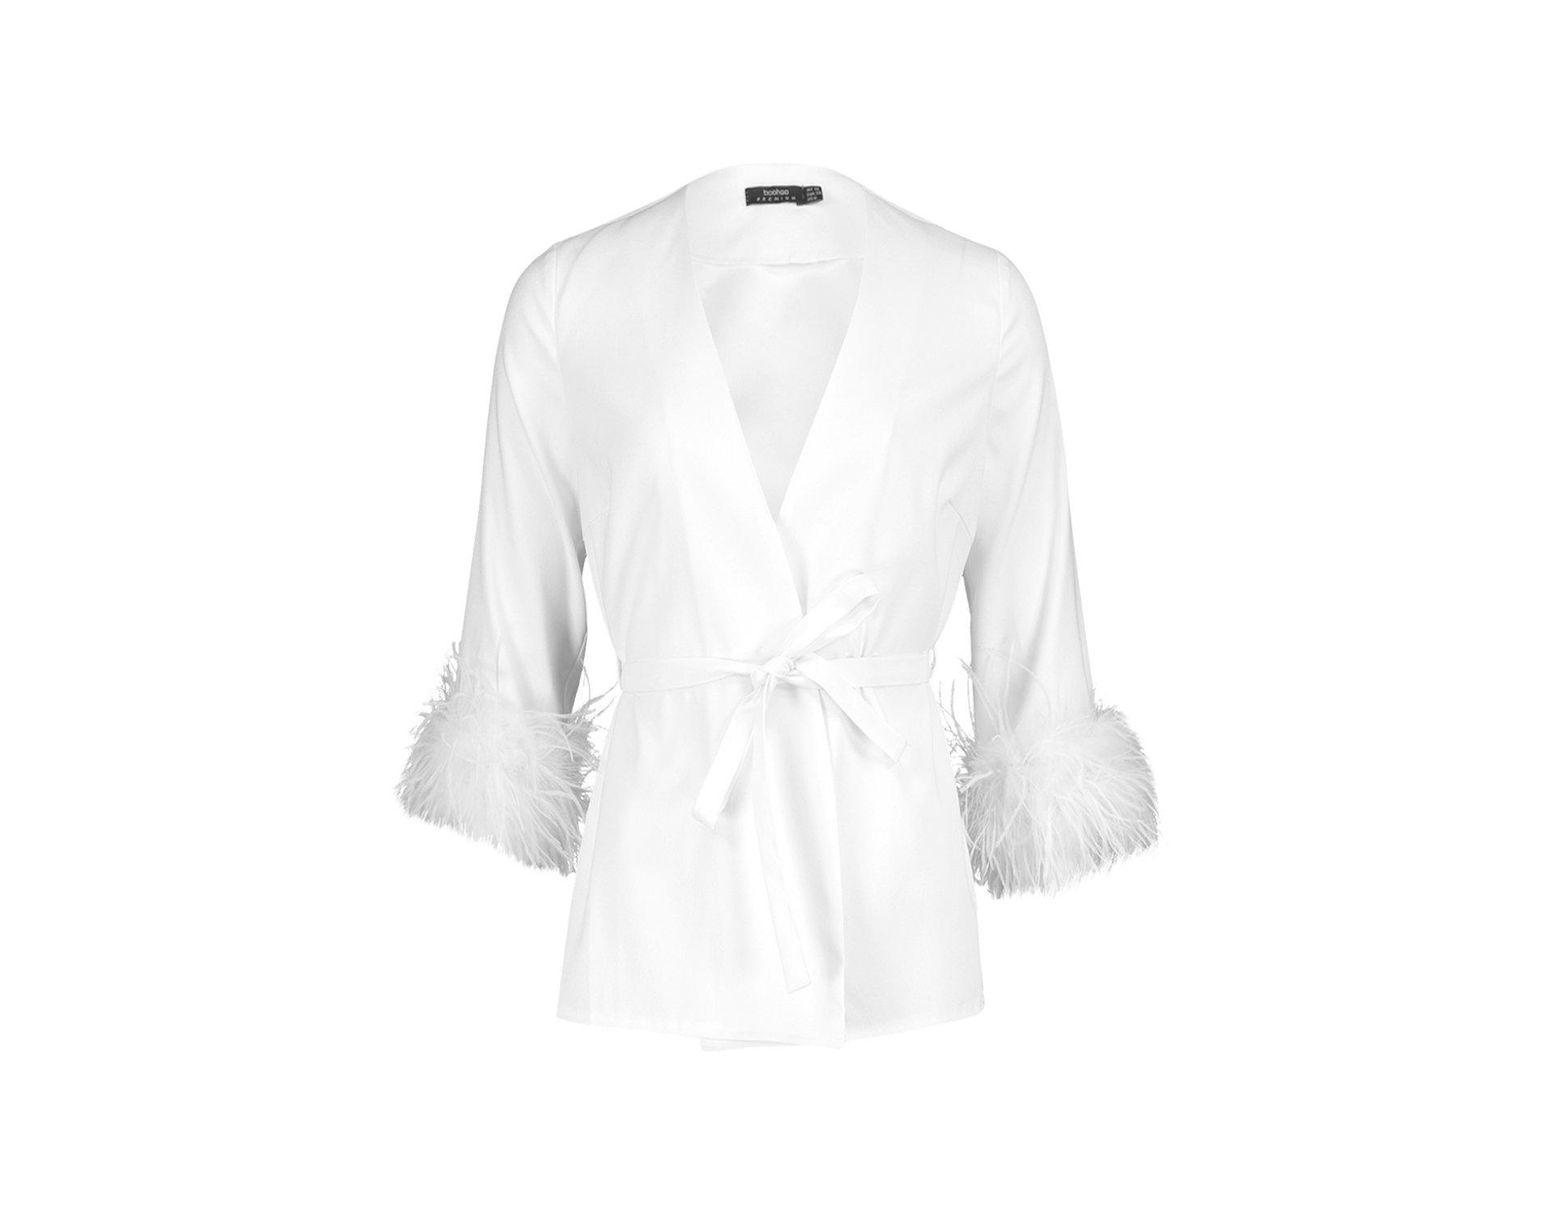 1feafb0be8700 Boohoo Premium Feather Trim Blazer Jacket in White - Lyst